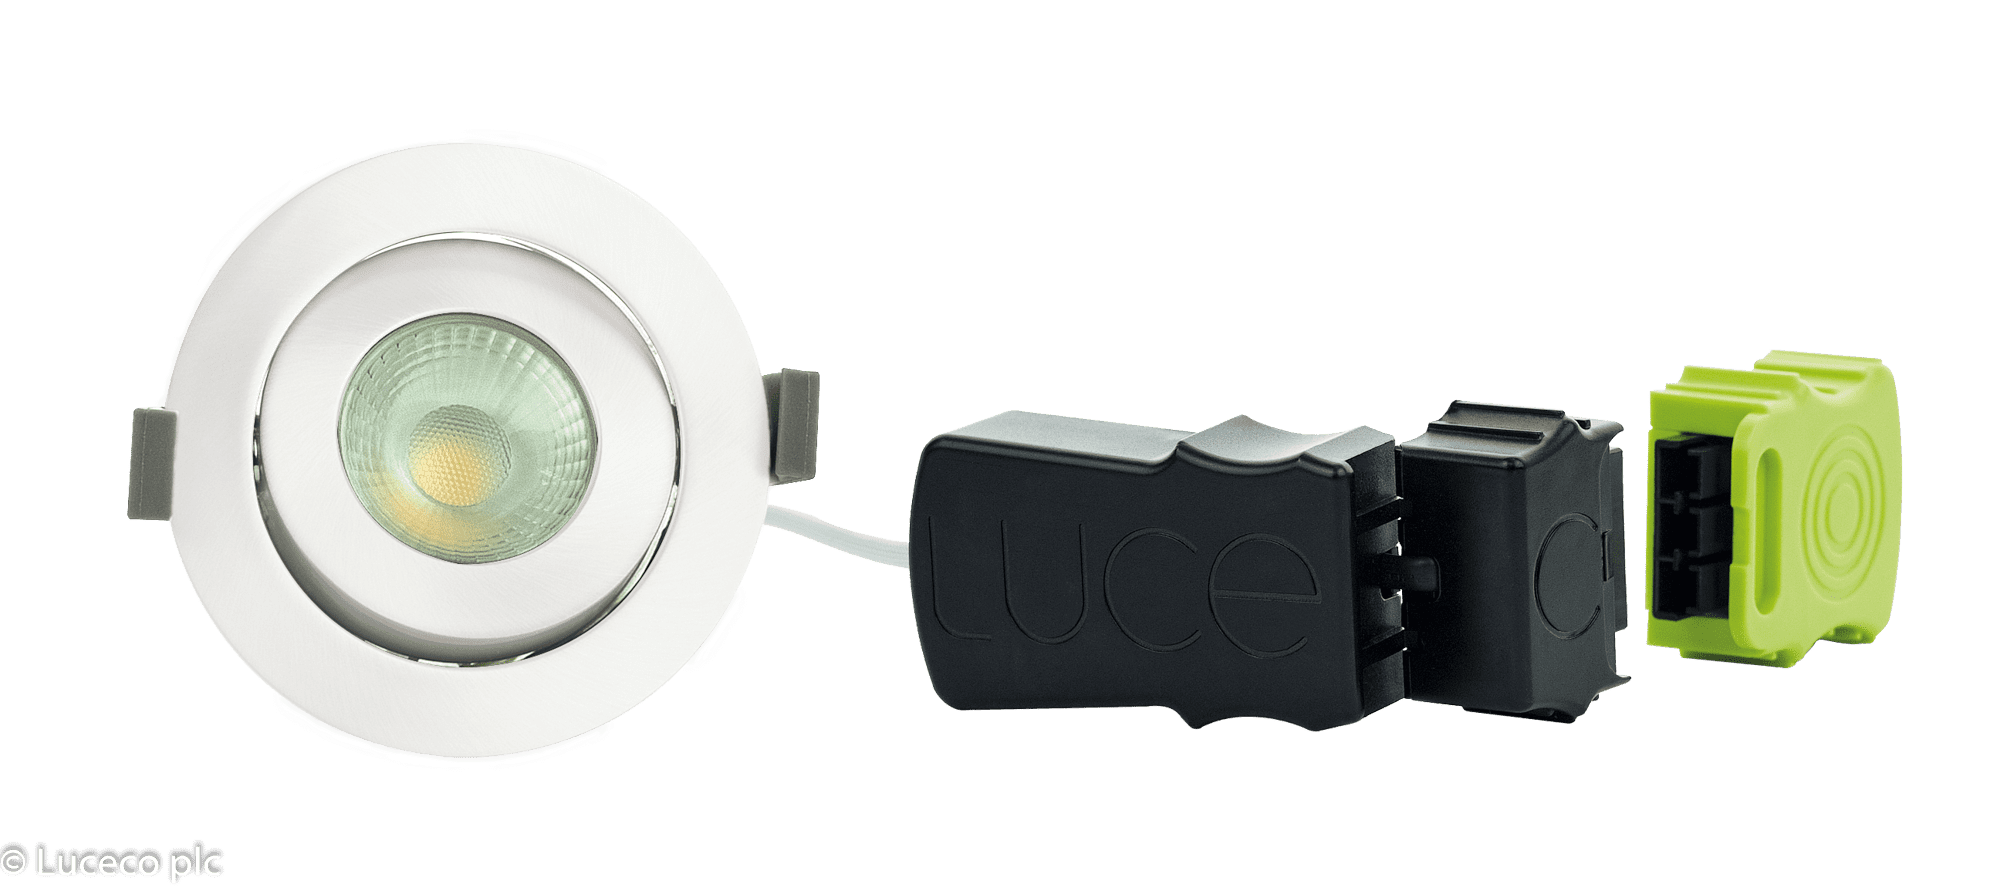 "Luceco LED Einbaustrahler schwenkbar weiß ""Element"" 8W  3000K 800lm dimmbar LDEA9W8D30weiß"